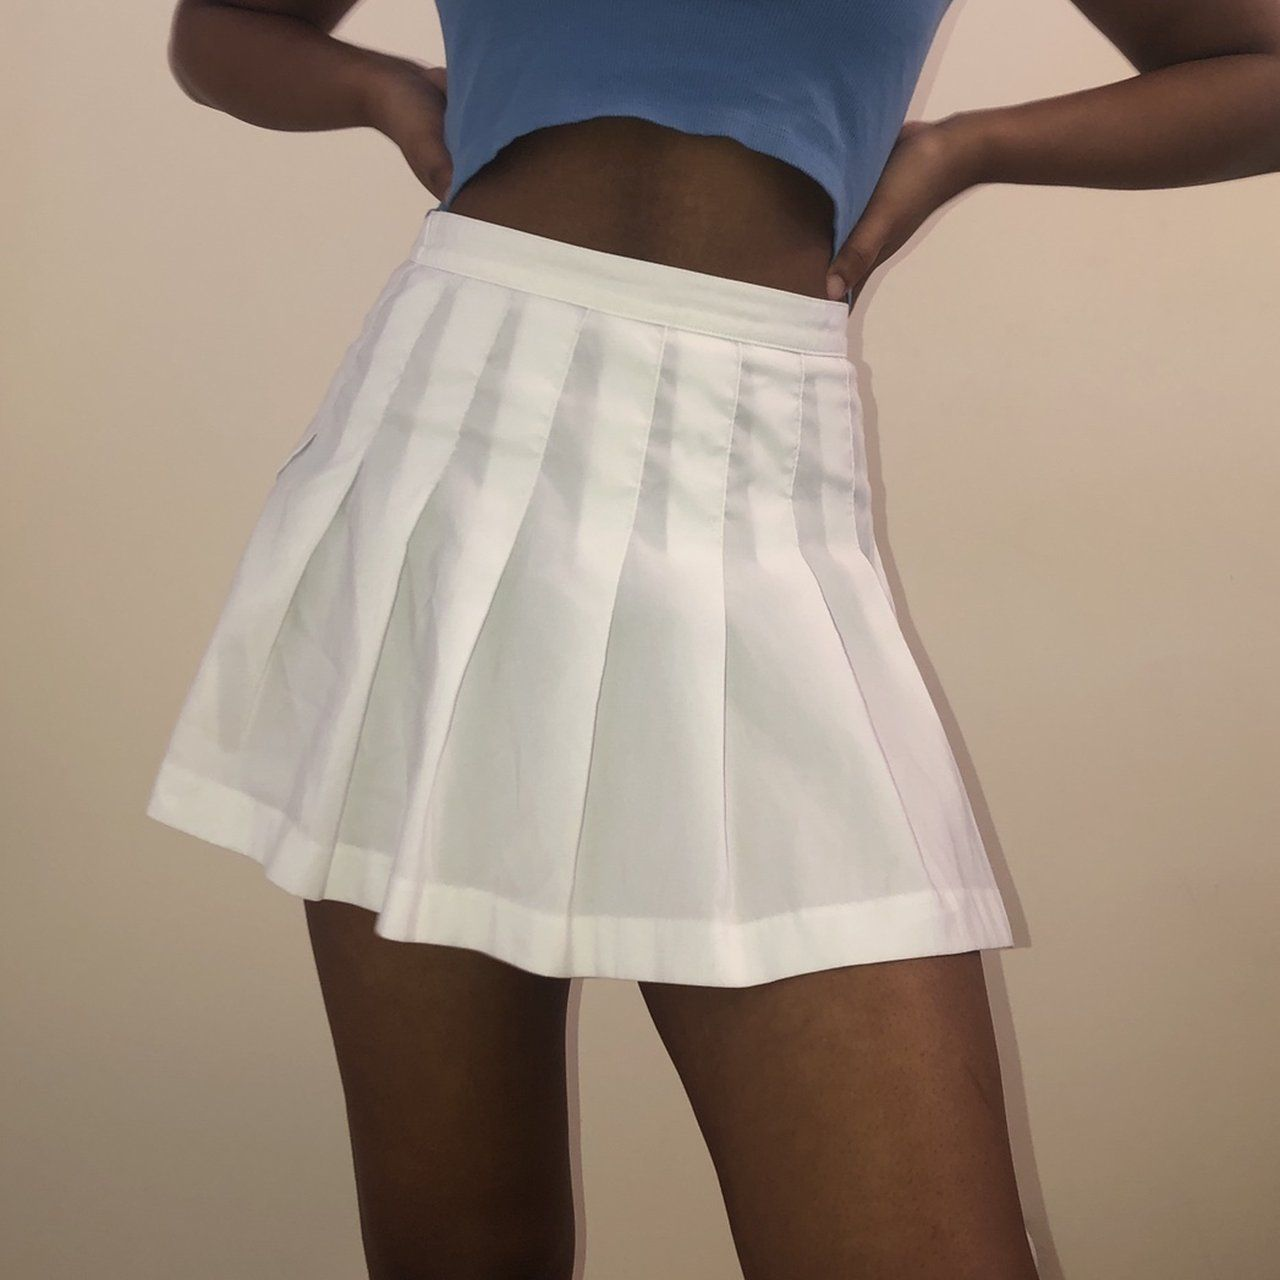 "4d2a29568e white high waisted pleated mini skirt. the brand is wilson. fits size small/medium.  26"" waist, 14.5"" length. model is 5'9.tags: tennis cheerleading school ..."